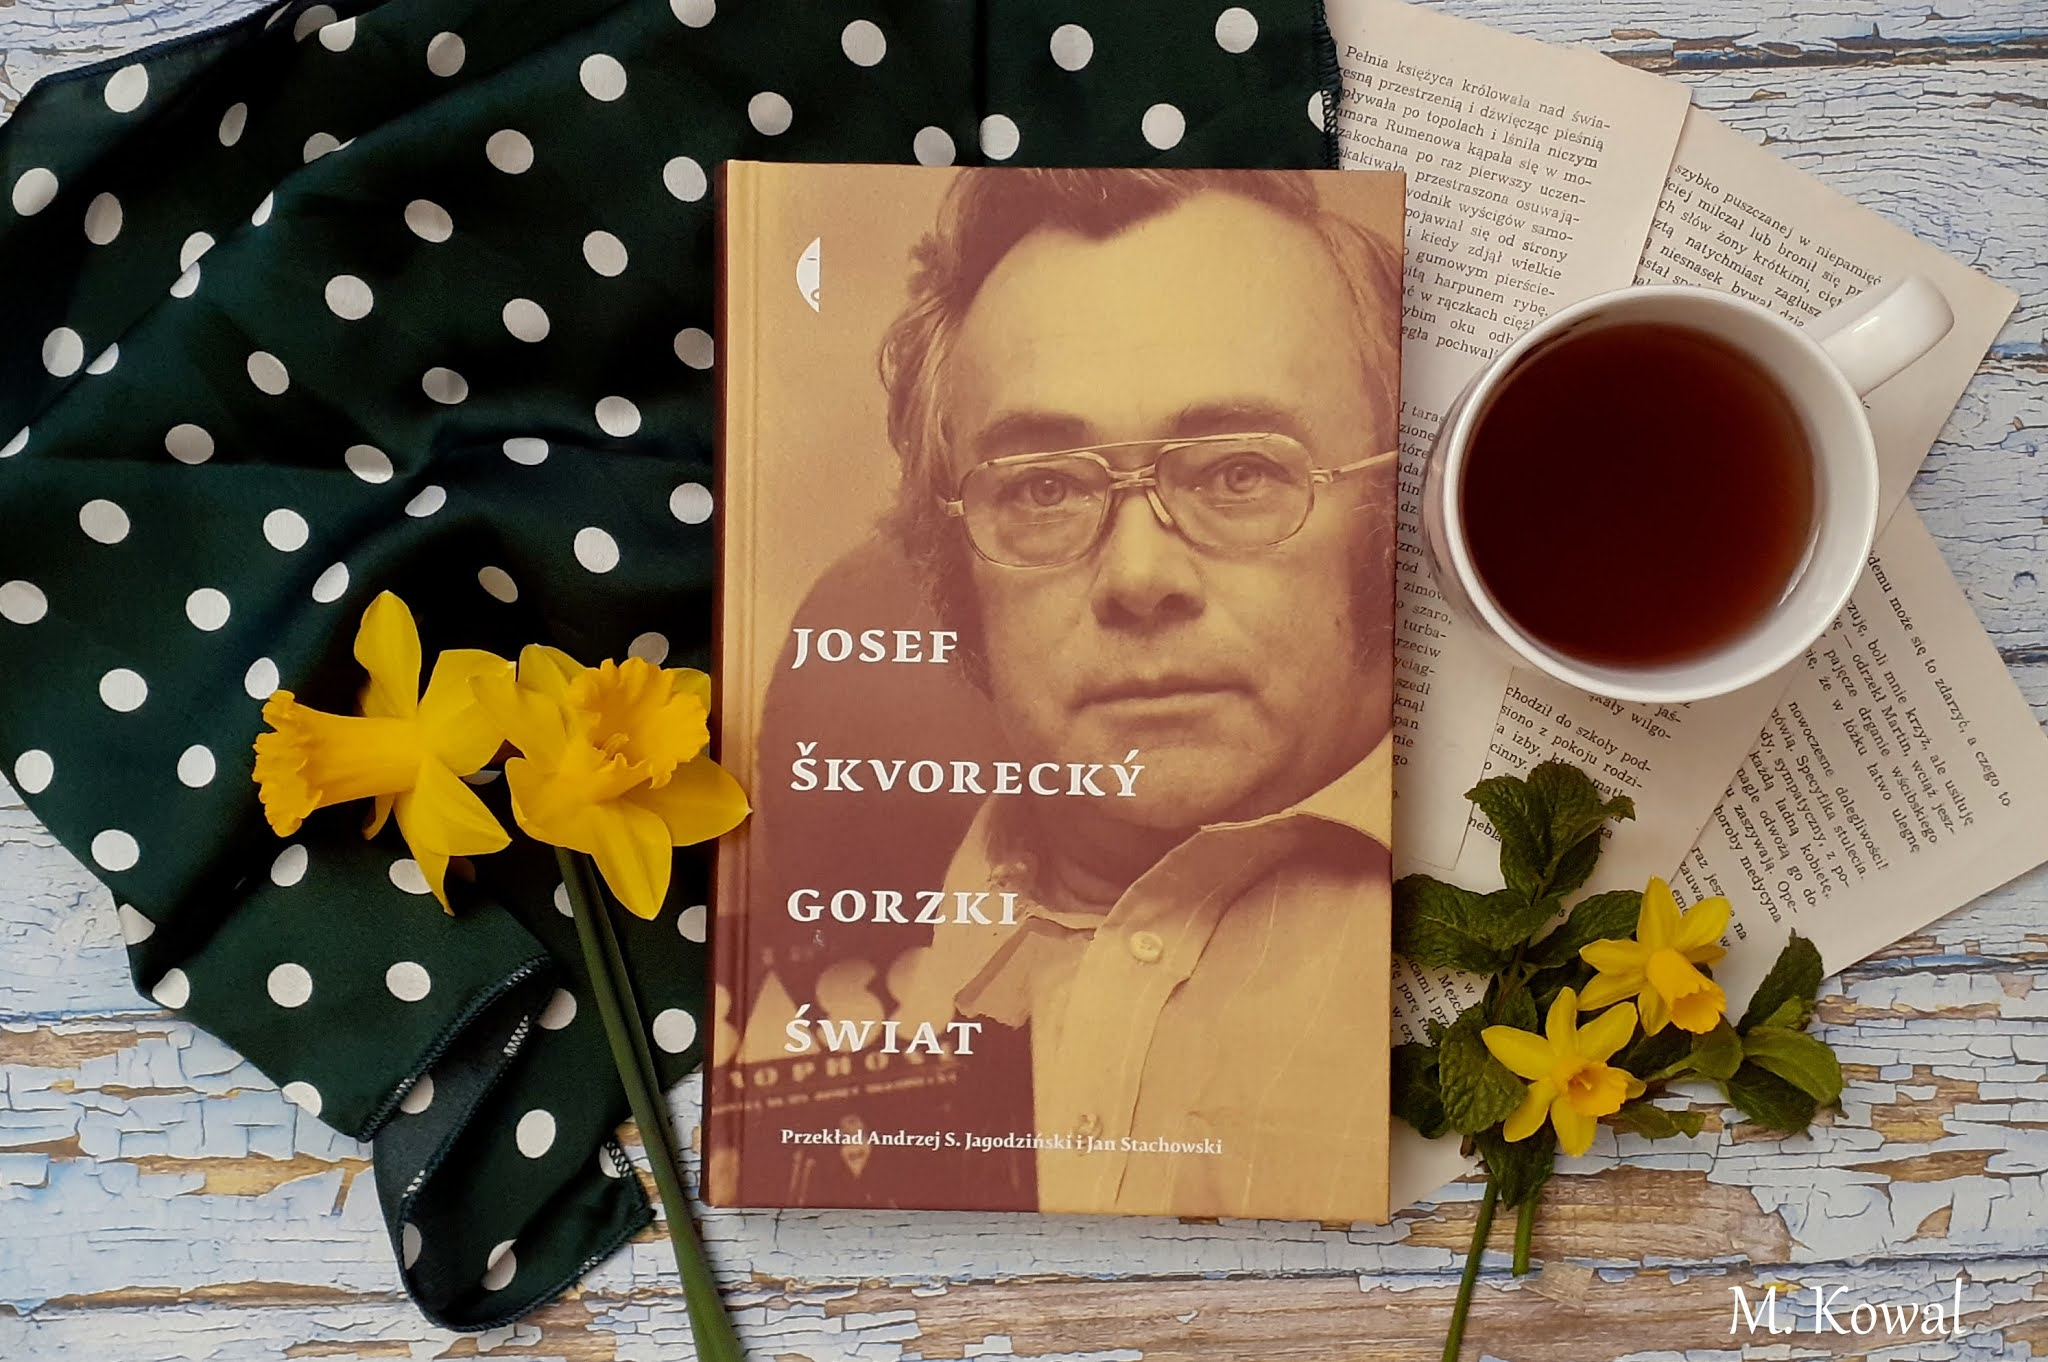 "książka ""Gorzki świat"" Josef Škvorecki"